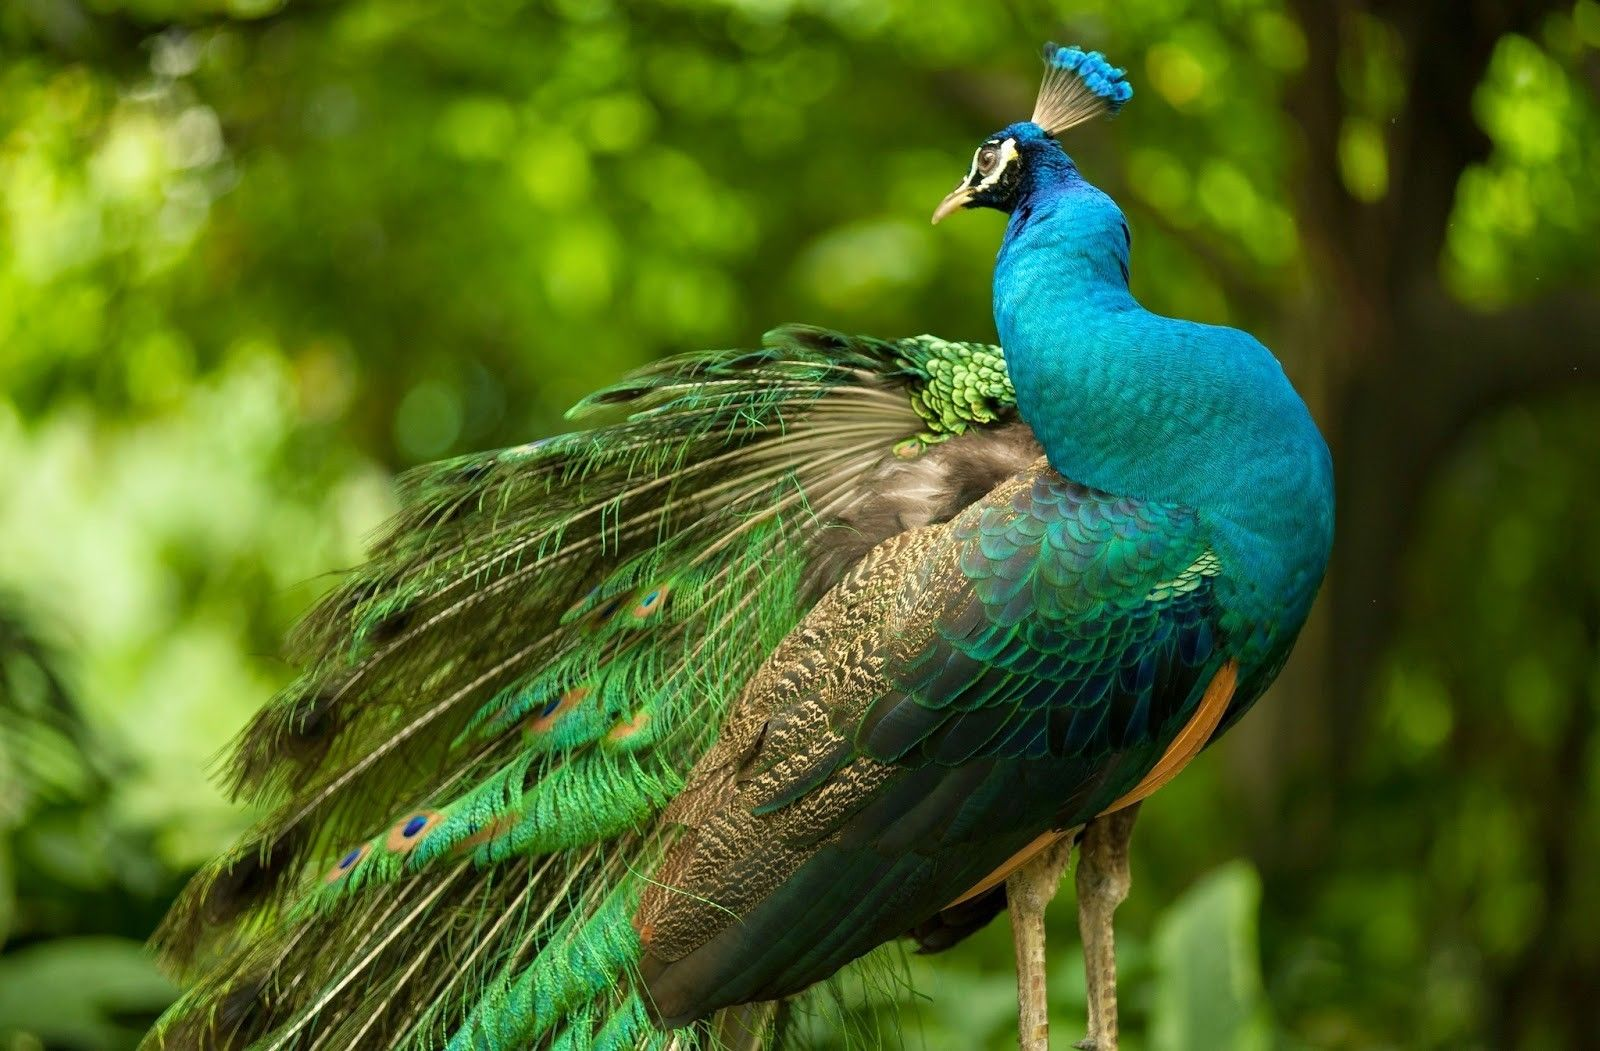 peacock photo gallery